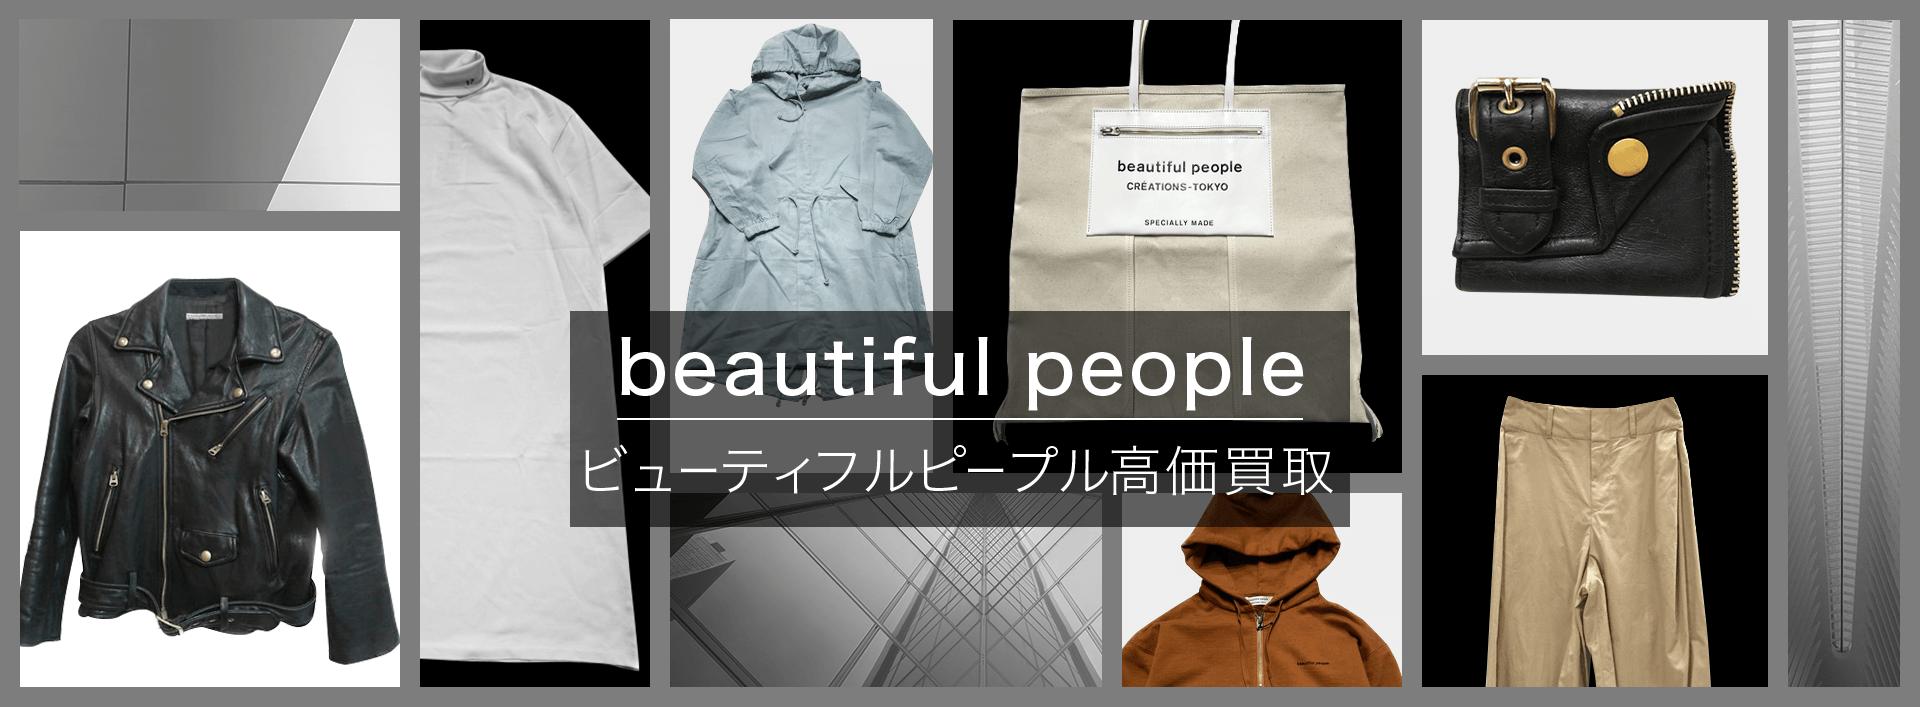 BEAUTIFUL PEOPLE(ビューティフル ピープル)高価買取